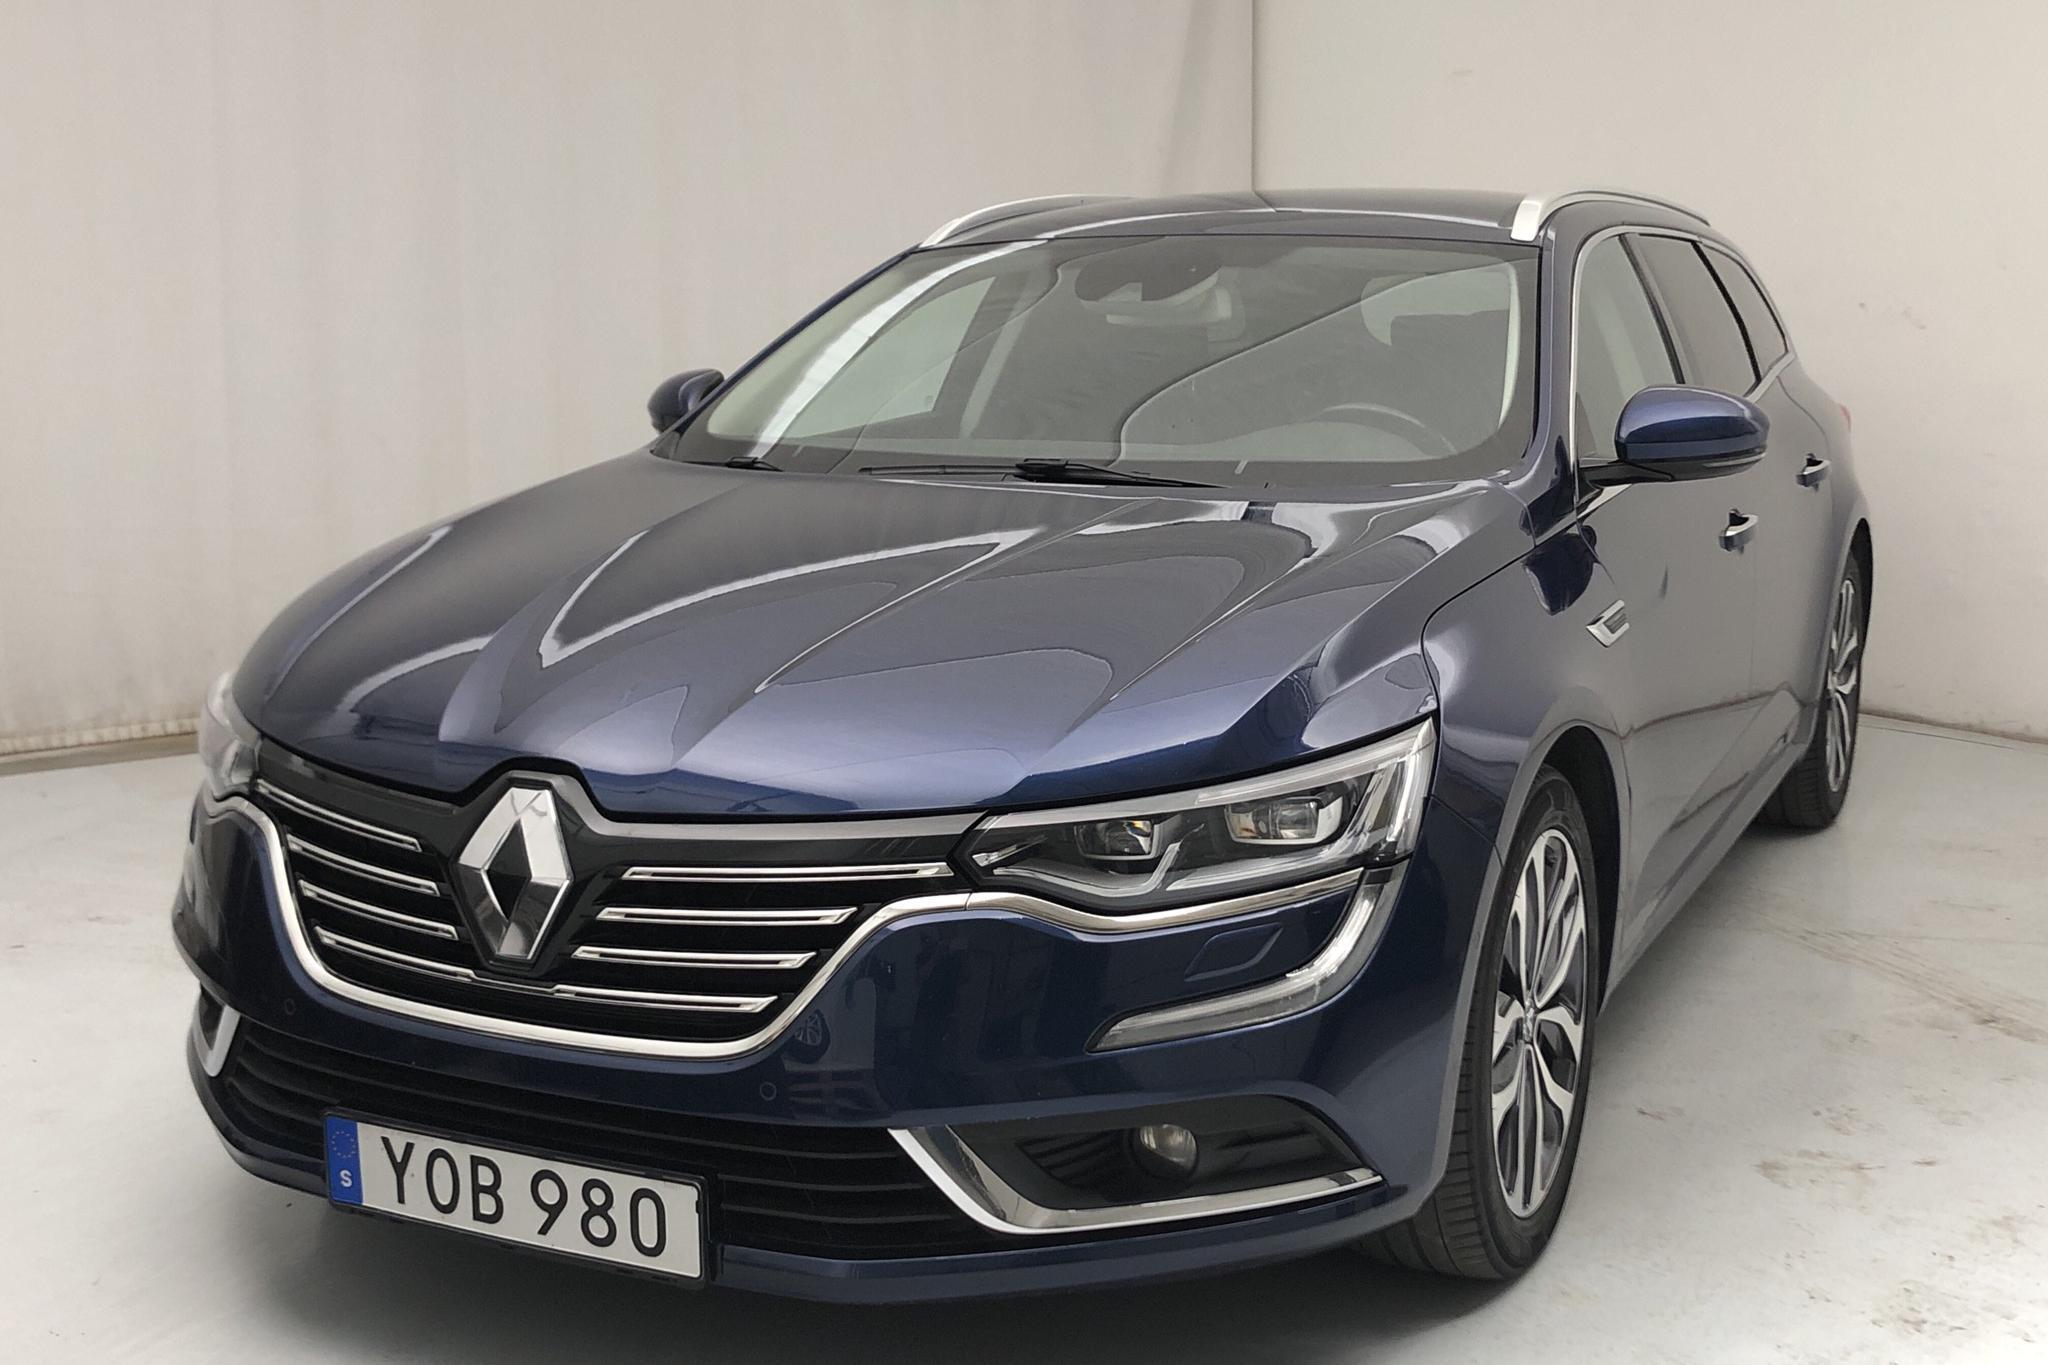 Renault Talisman 1.6 dCi Kombi (160hk)